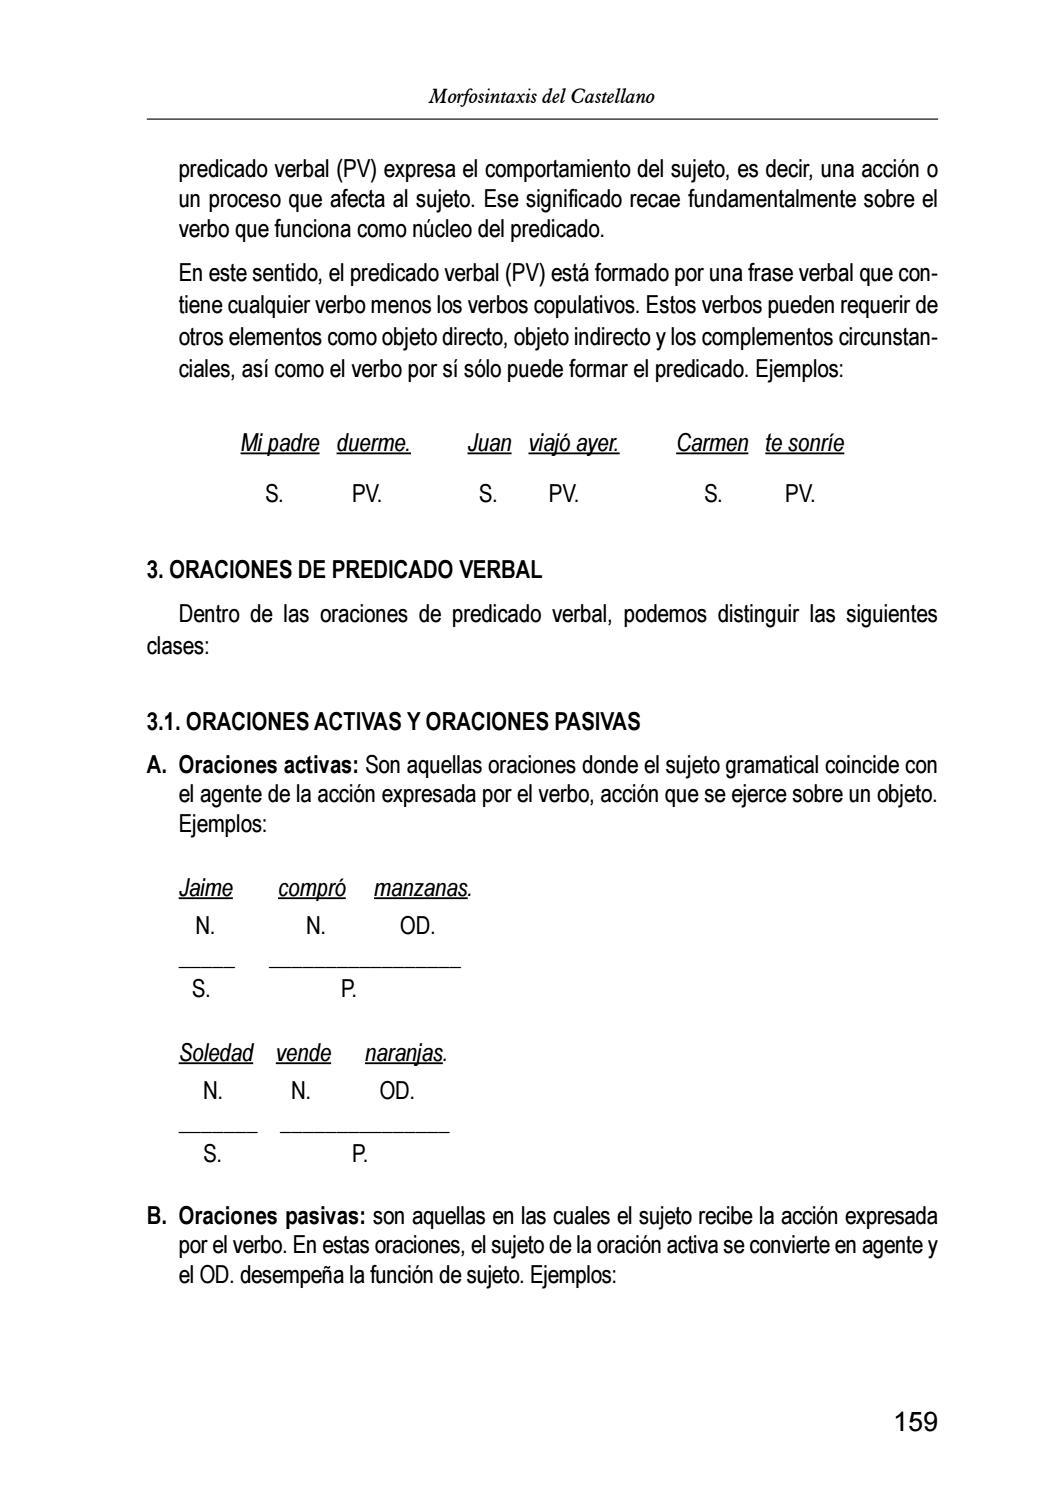 Morfosintaxis del Castellano by UNMSM-PROLEX - issuu